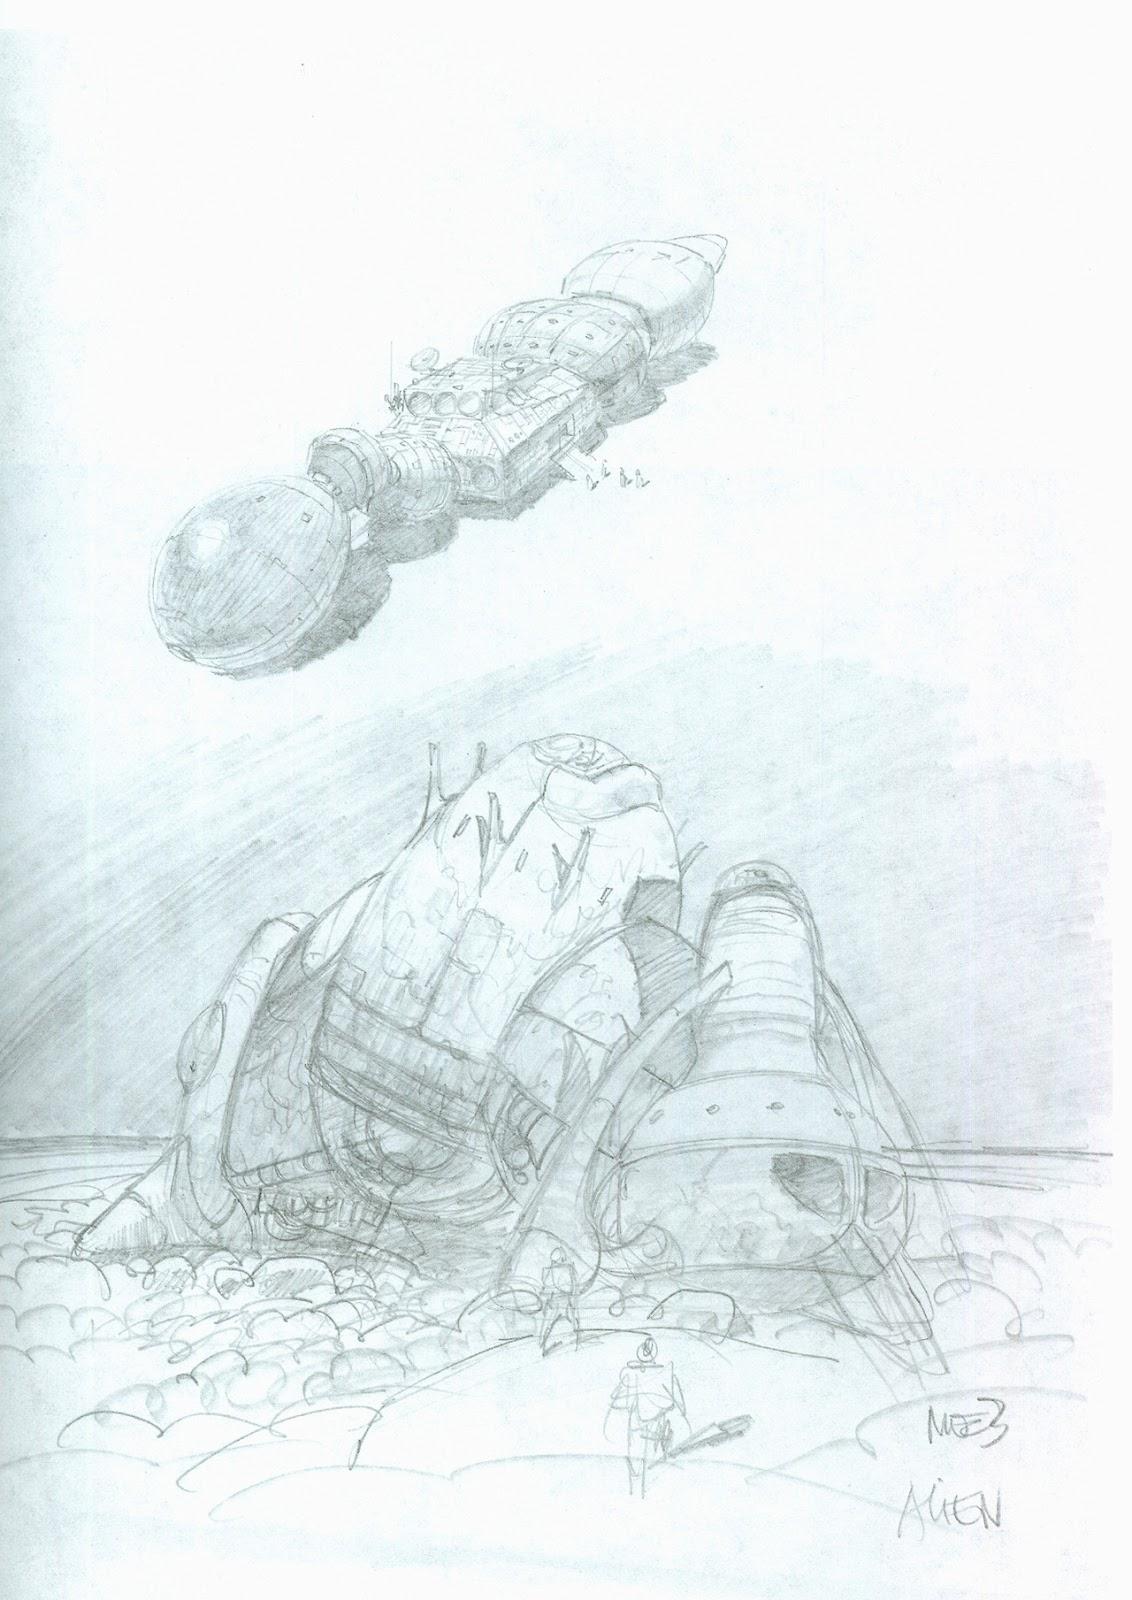 1132x1600 Alien Explorations Alien Moebius' Alien Spaceship Concepts